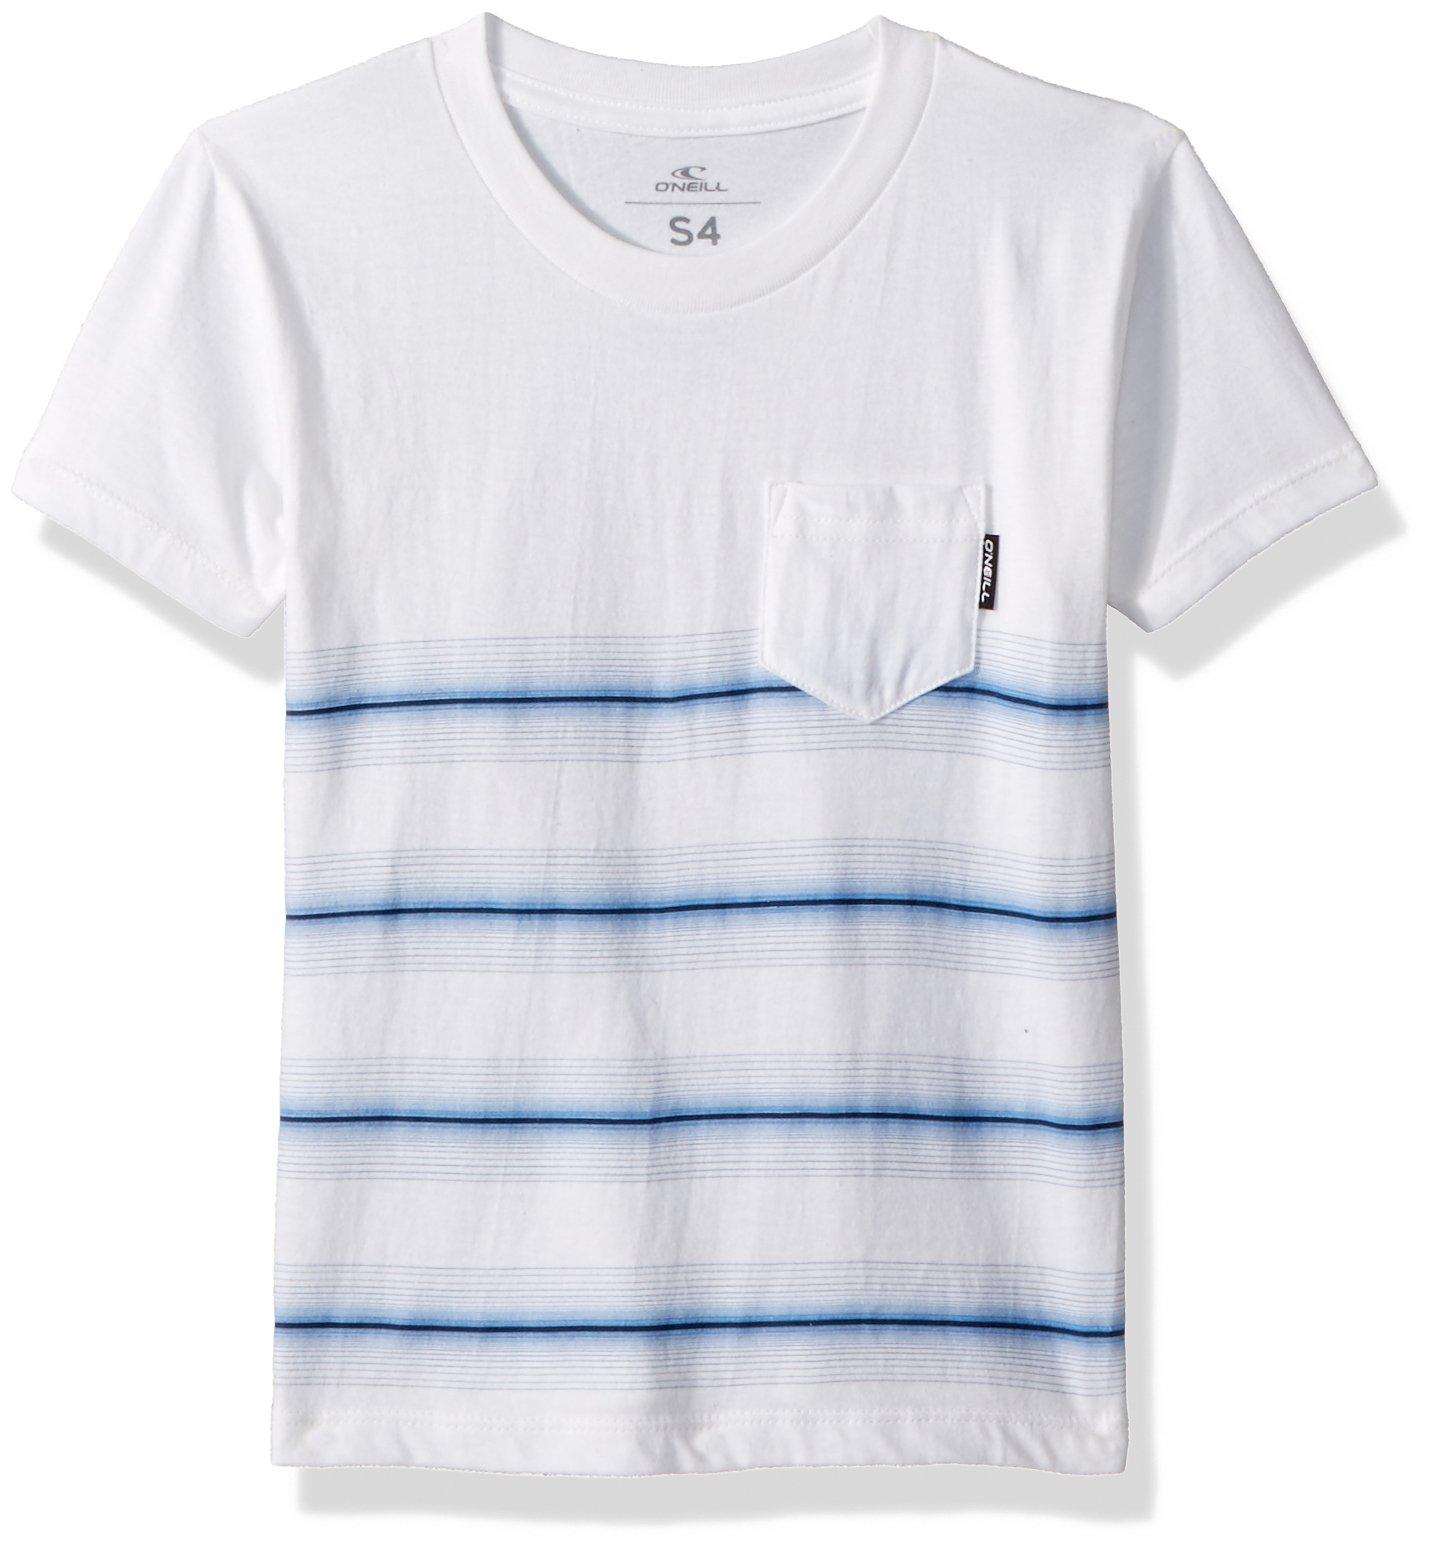 O'Neill Little Boys' Printed Stripe Short Sleeve Tee, Pho White, 2T